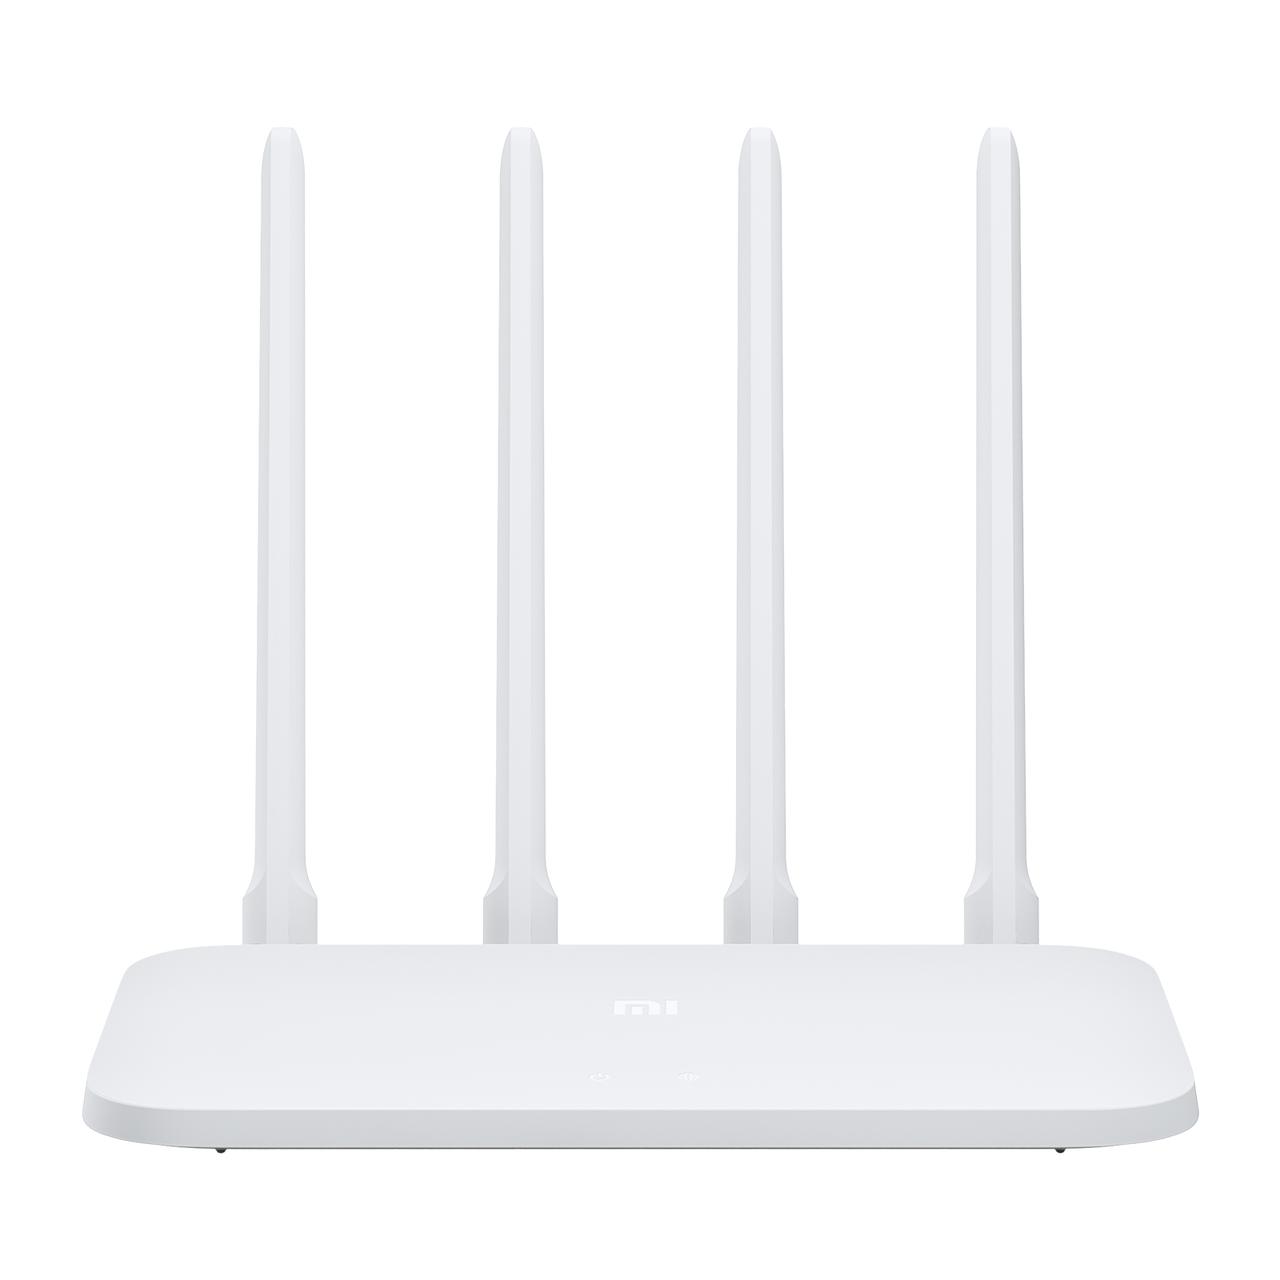 Оригинал Xiaomi Mi WiFi Router 4C Global EU DVB4231GL .